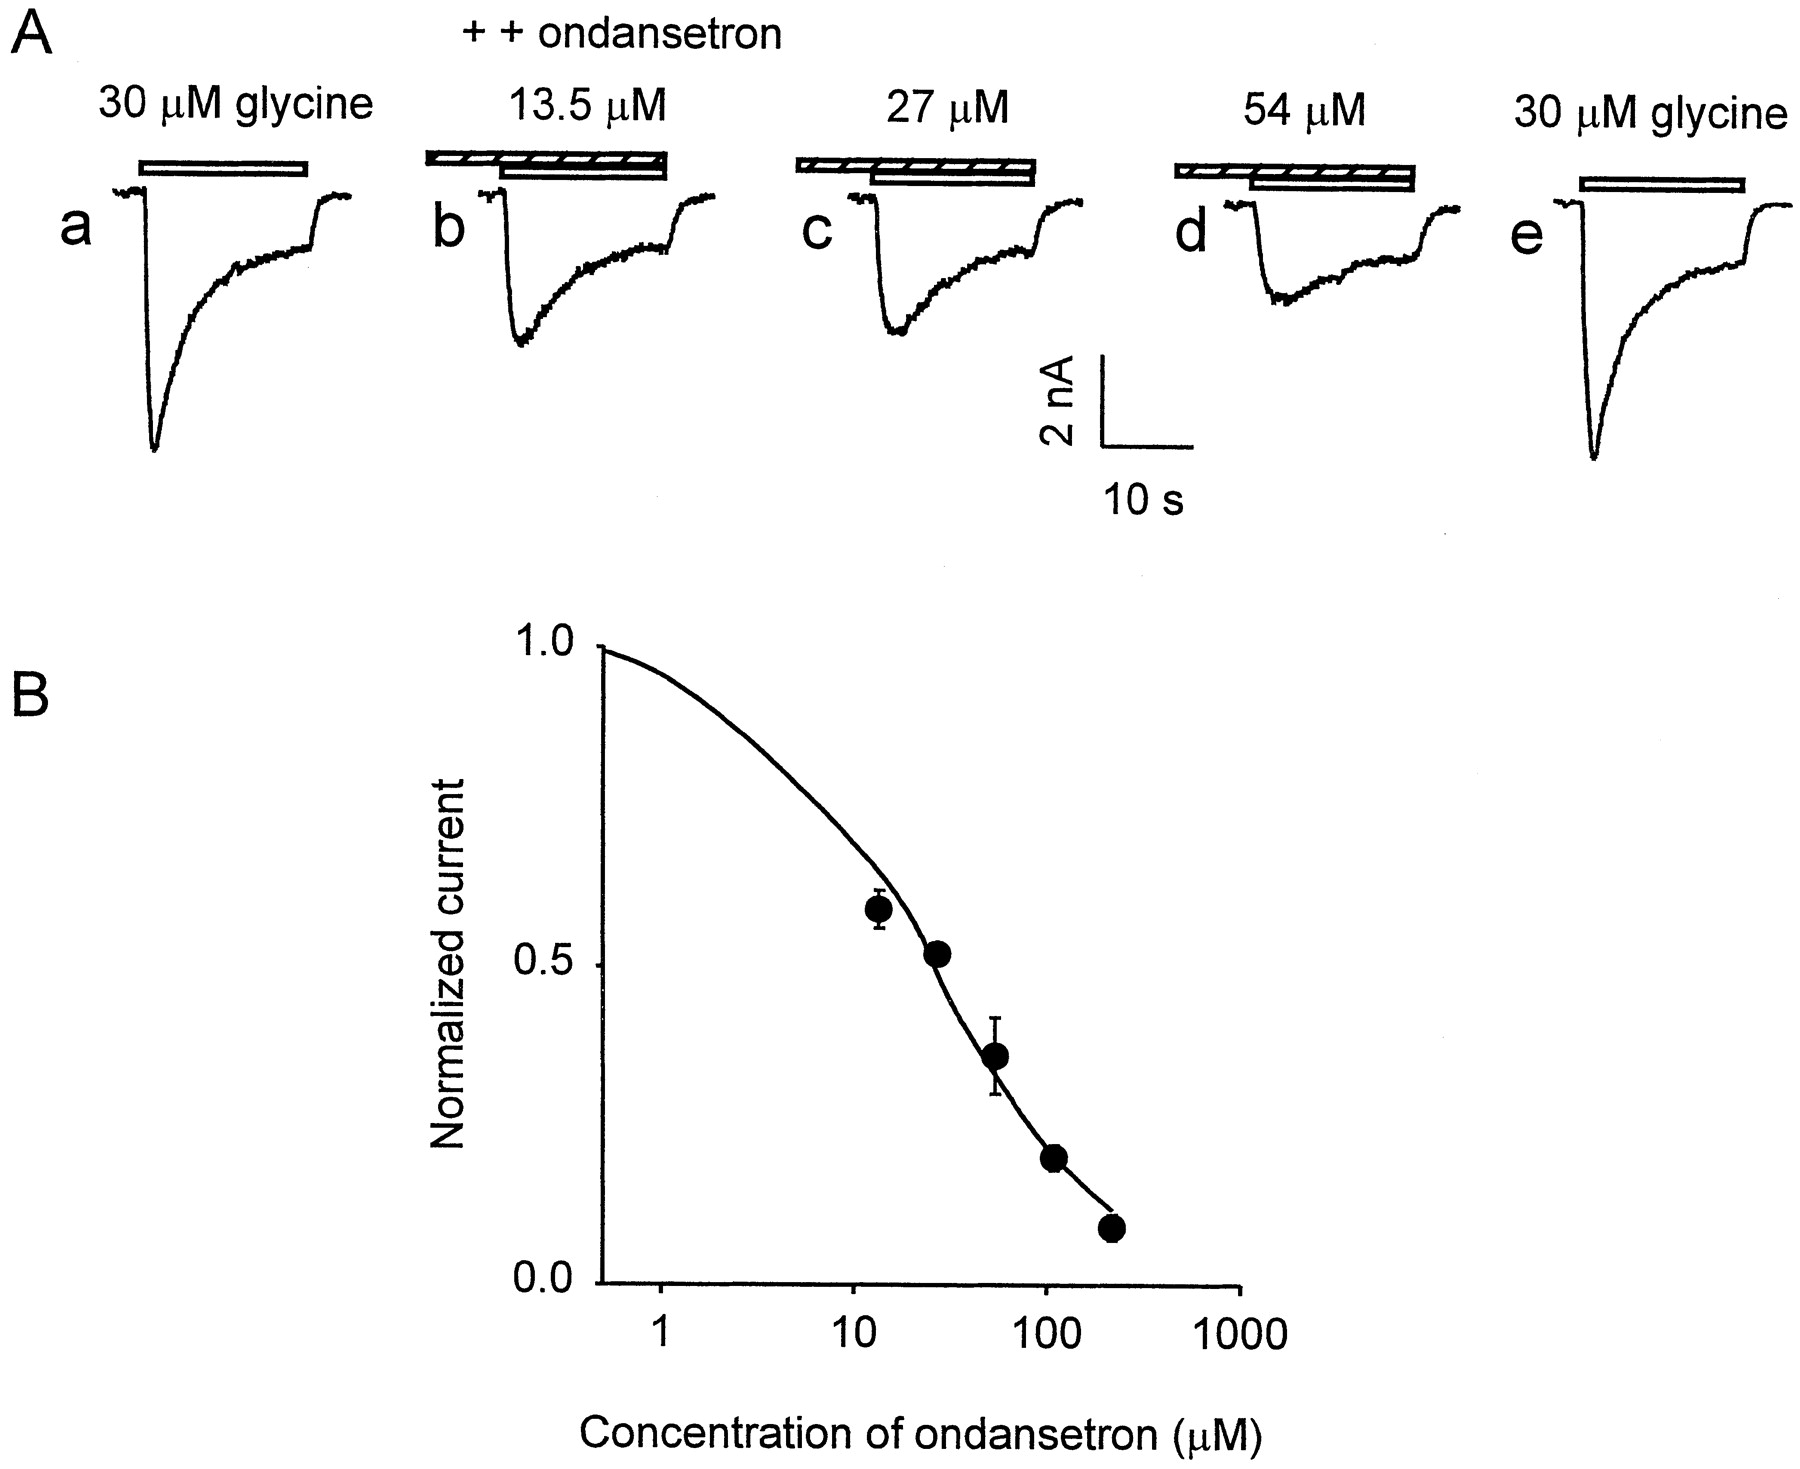 Inhibitory Effect of Ondansetron on Glycine Response of Dissociated